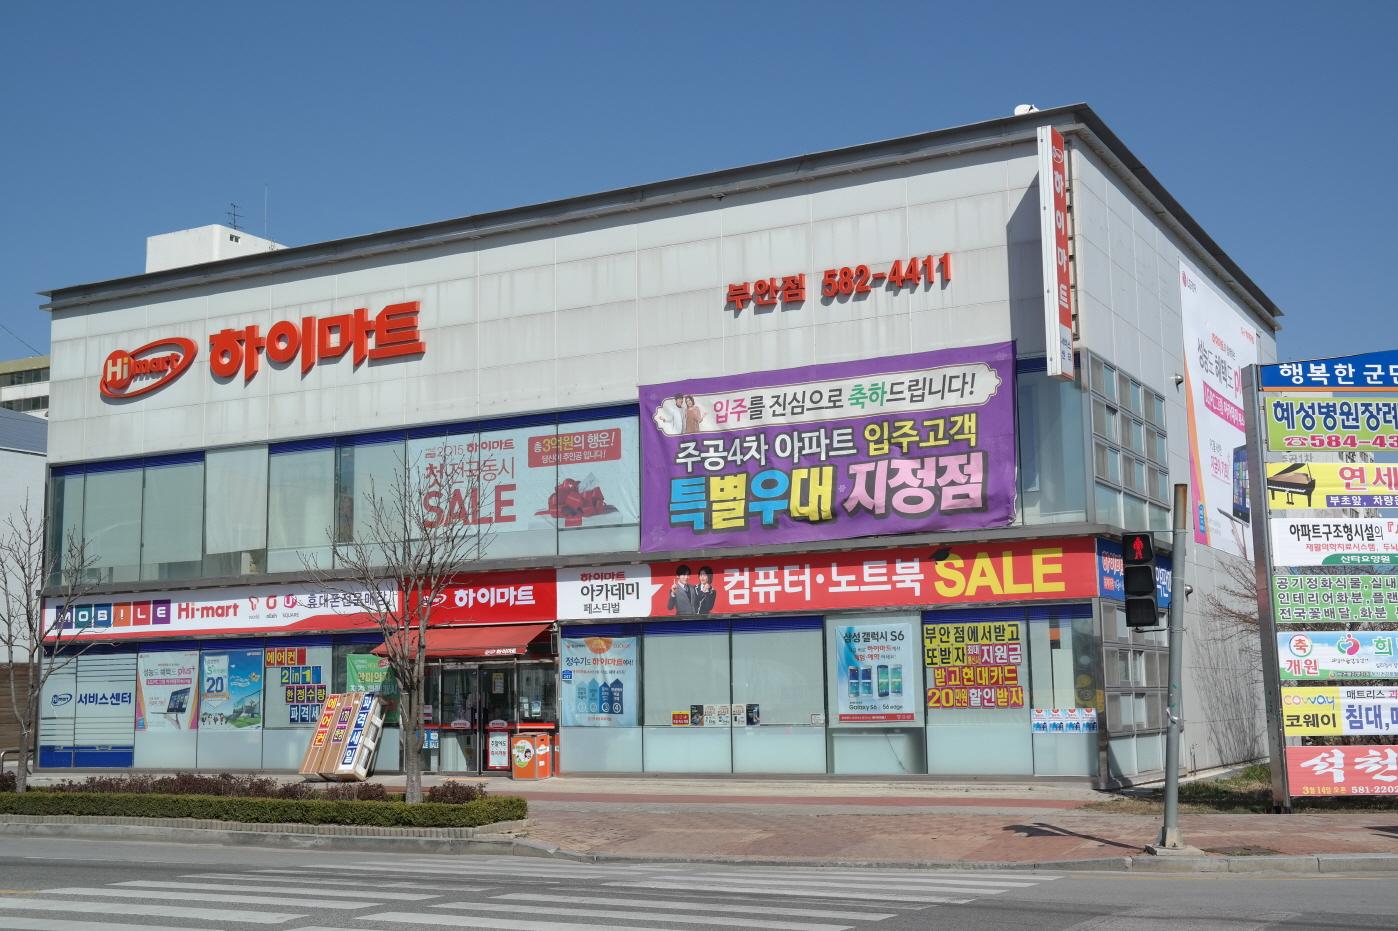 Lotte Hi-mart – Buan Branch (롯데 하이마트 (부안점))